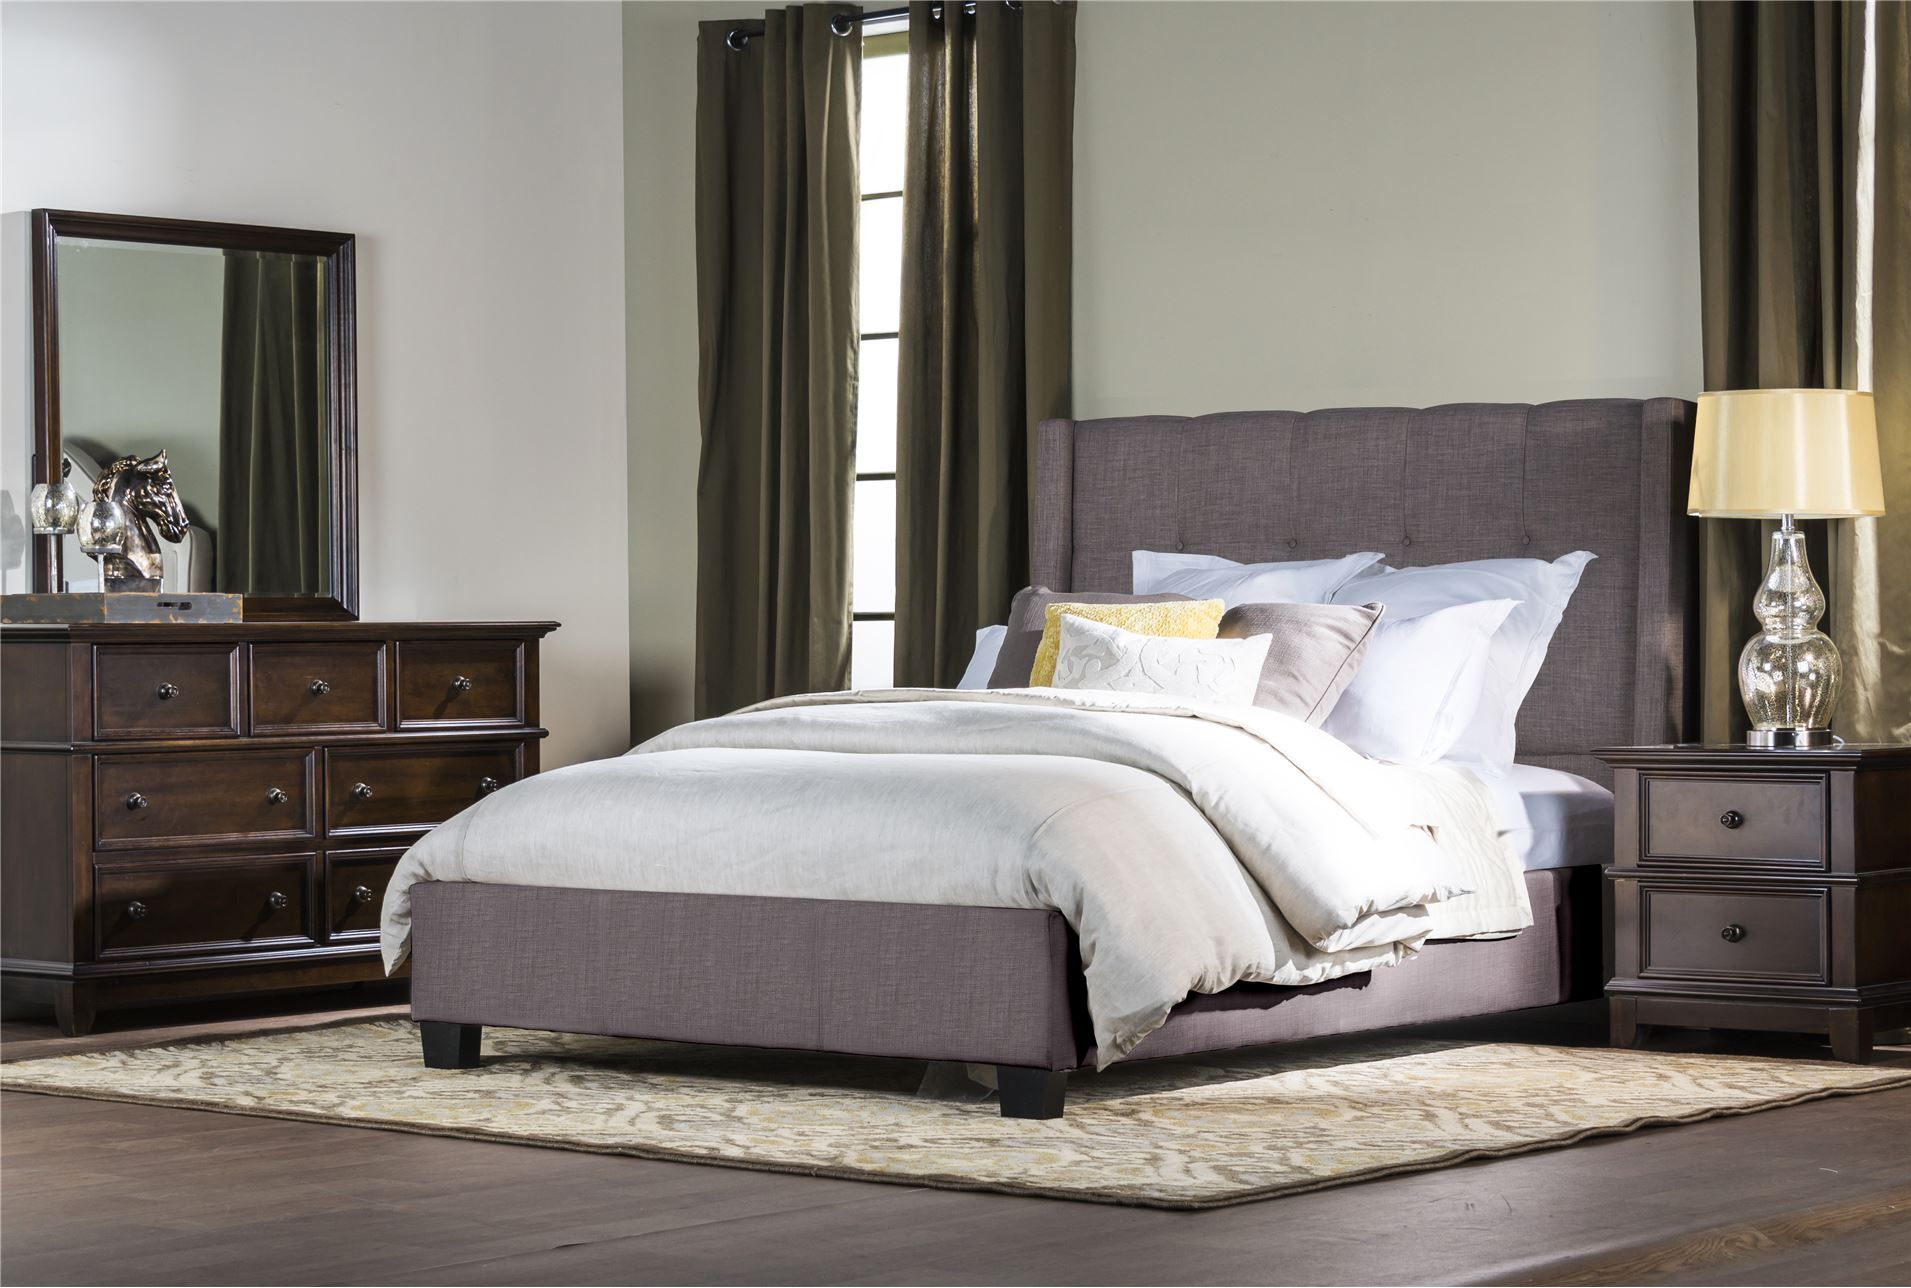 Damon California King Upholstered Platform Bed Living Spaces Schlafzimmer Design Schlafzimmer Schlafzimmermobel